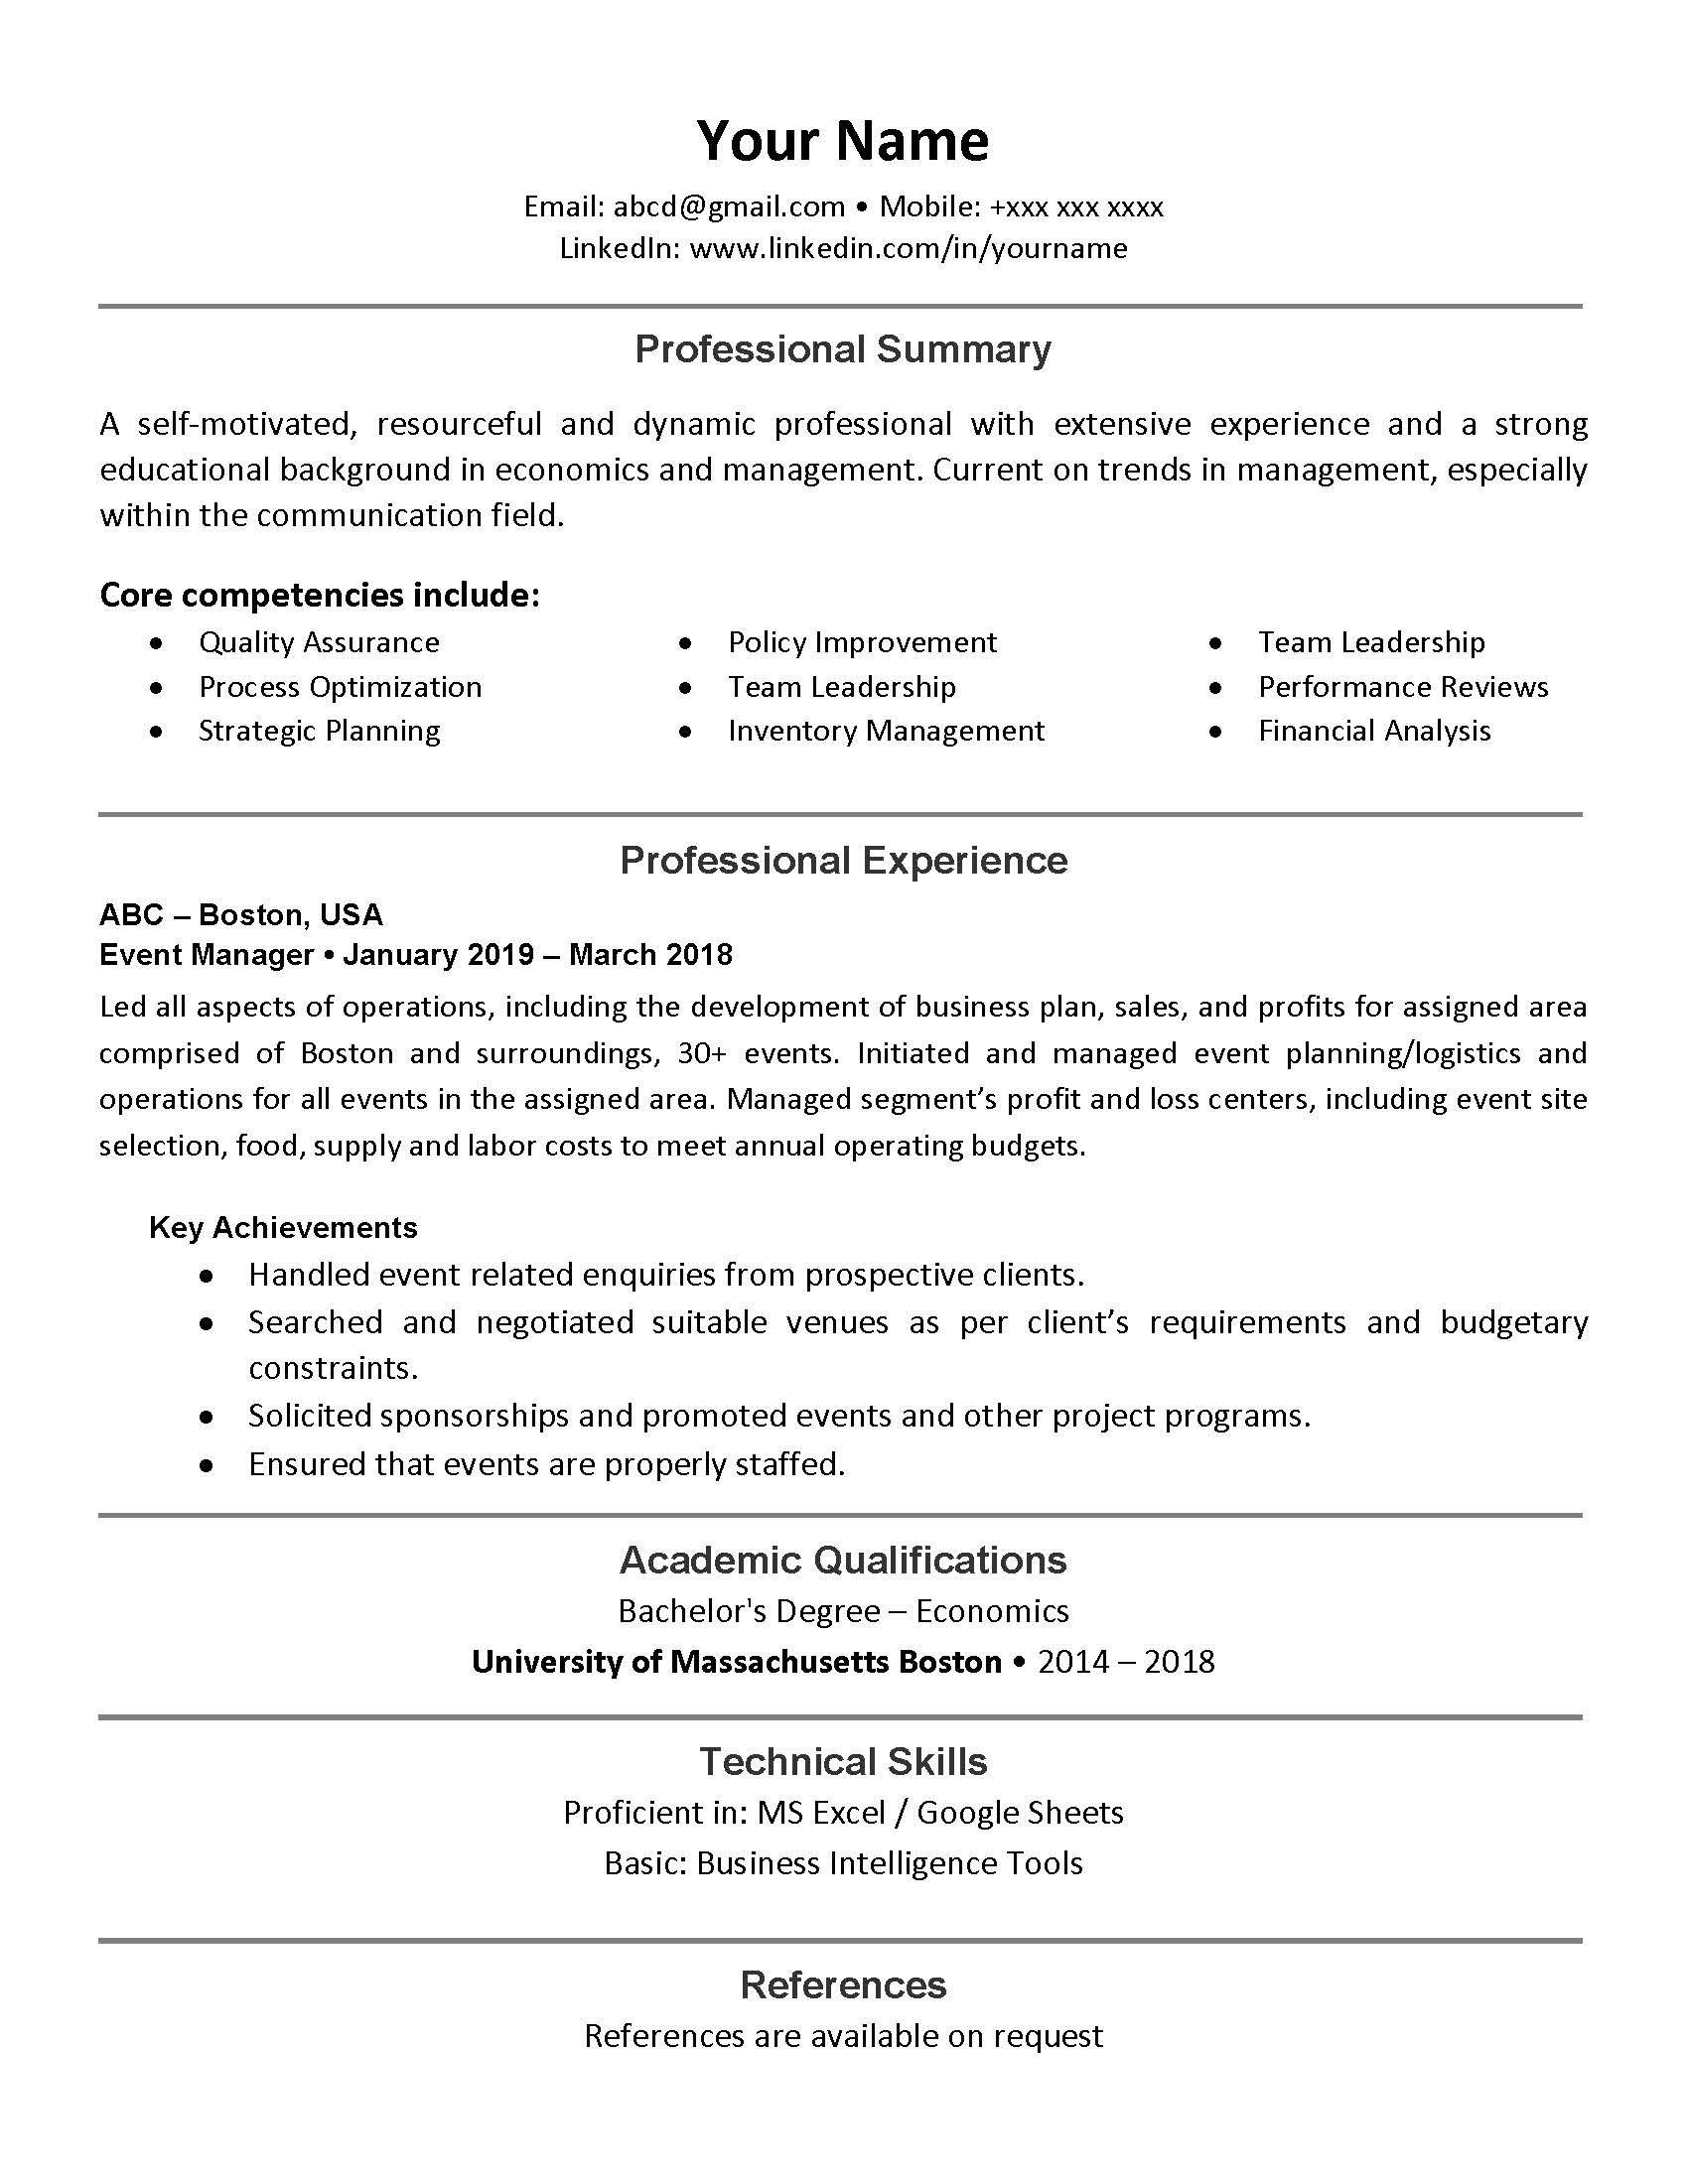 Karar45 I Will Build Or Modify Resume Cv Cover Letter And Linkedin For 20 On Fiverr Com Lettering Resume Writing Services Cover Letter